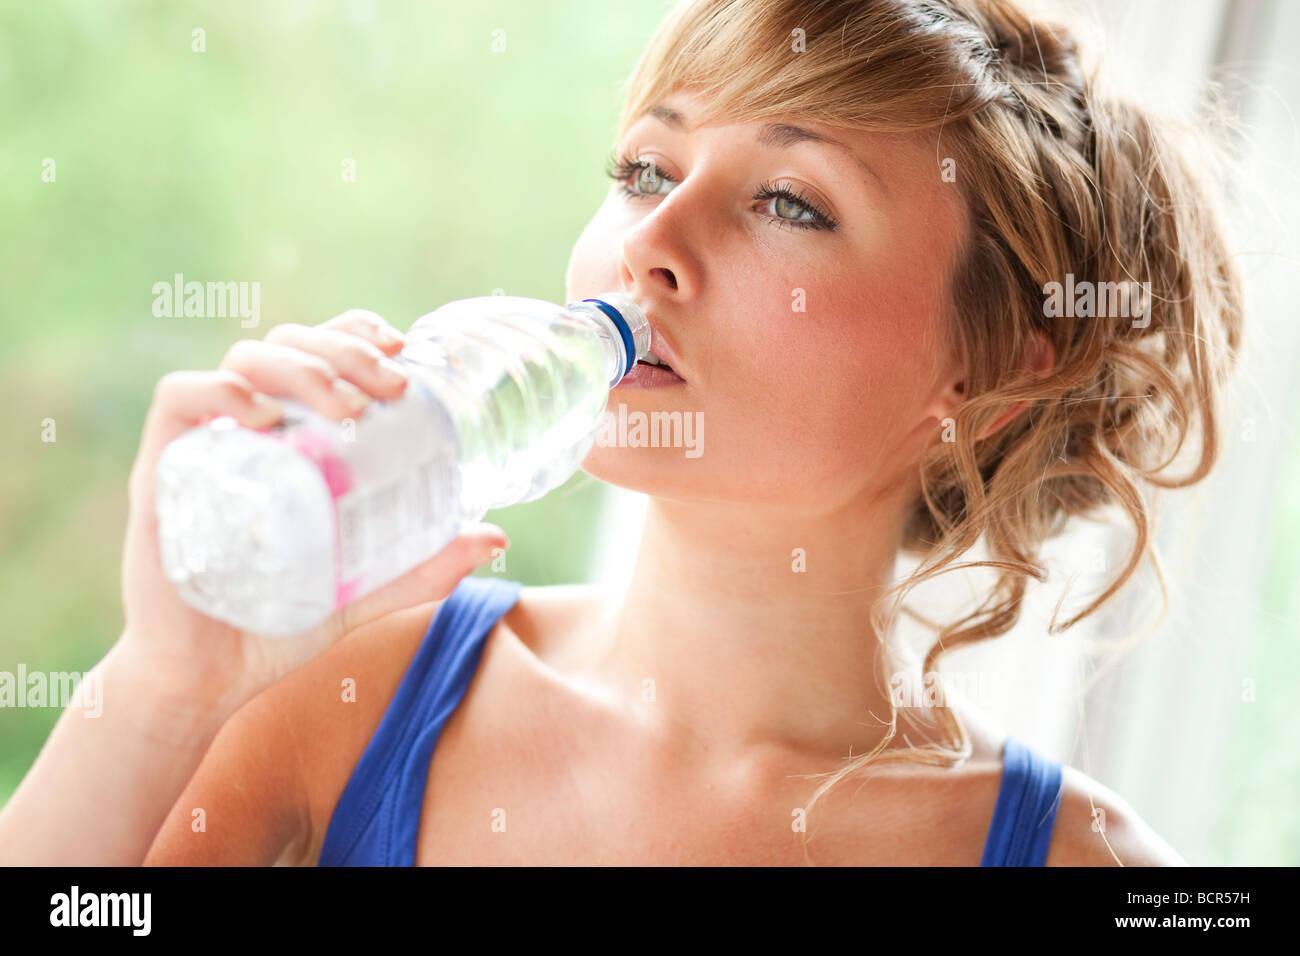 Chica vaso de agua potable Imagen De Stock